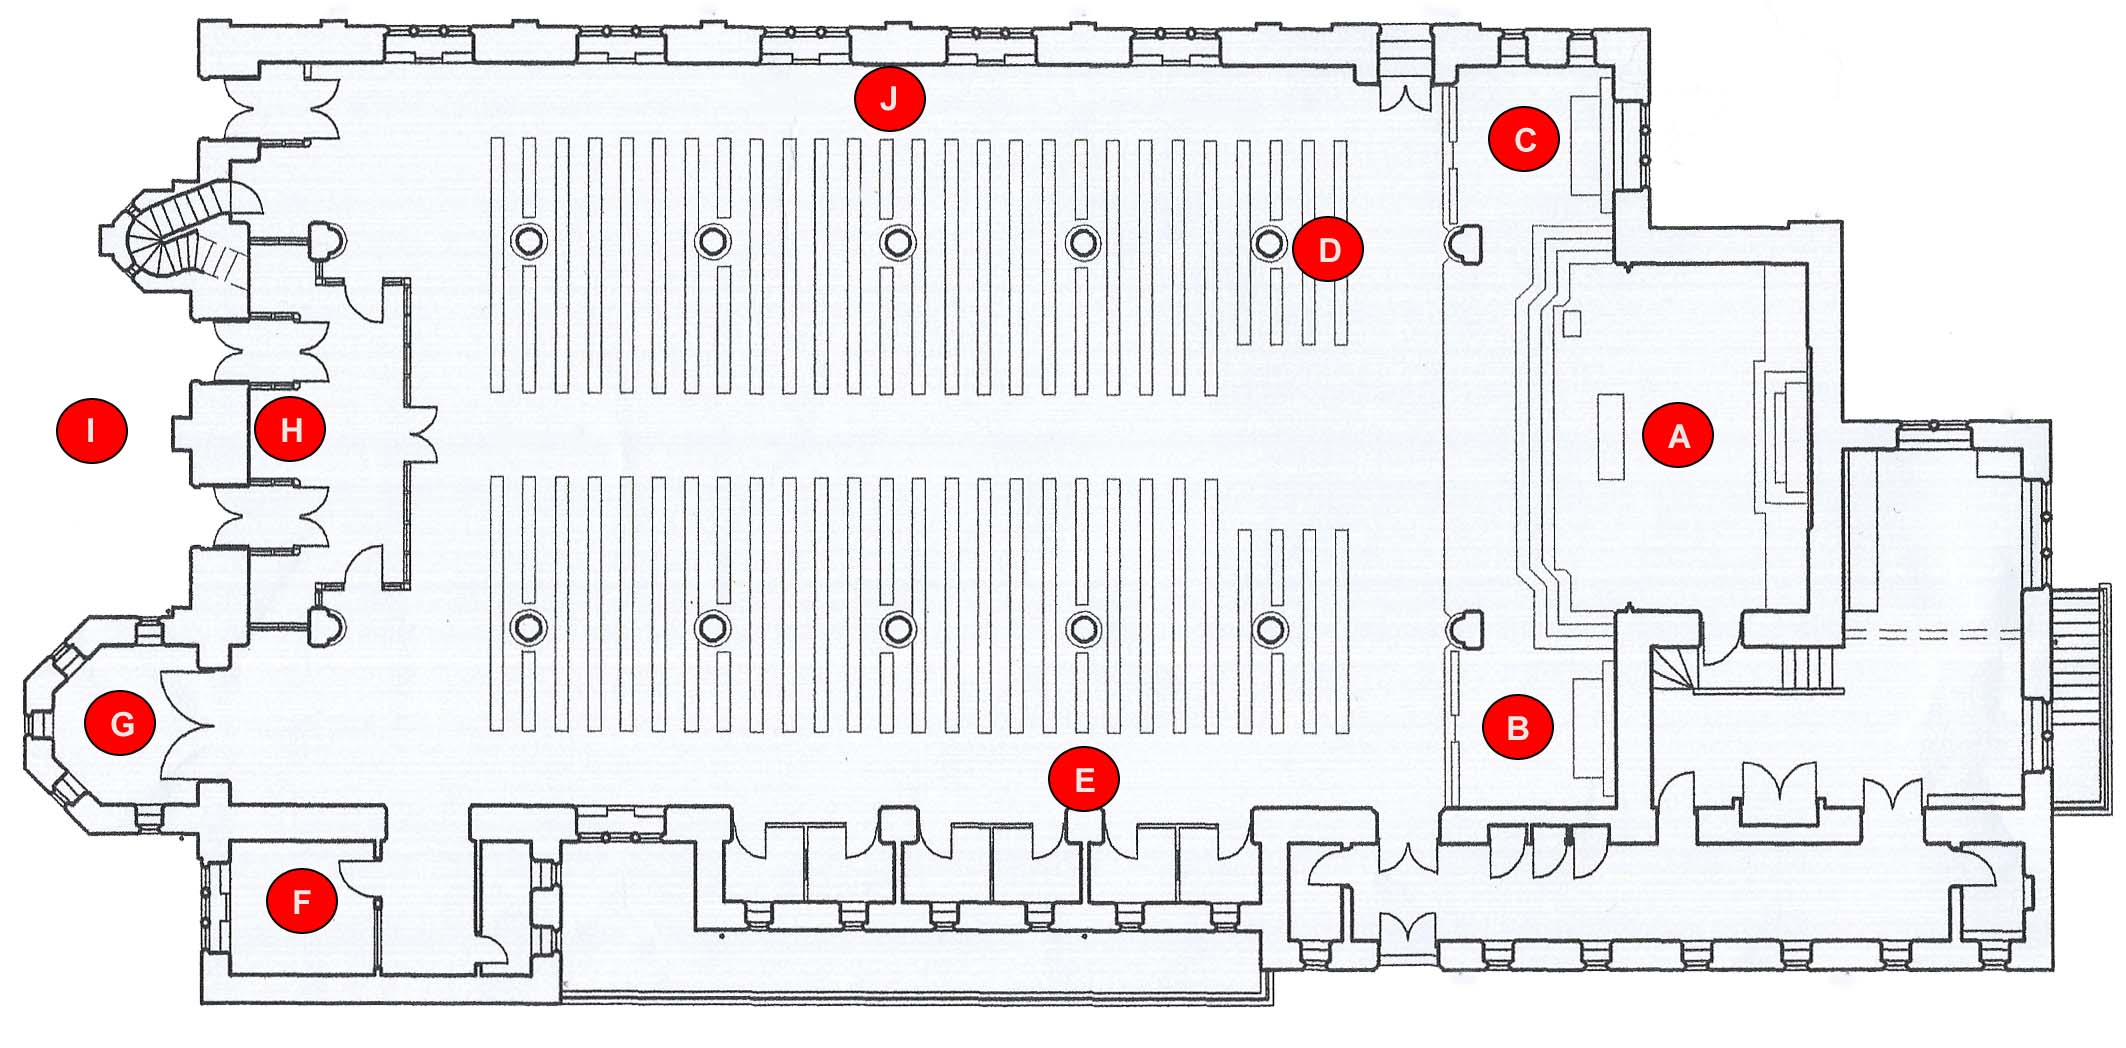 catholic church structure diagram ishikawa fishbone template of as a cross areas elsavadorla